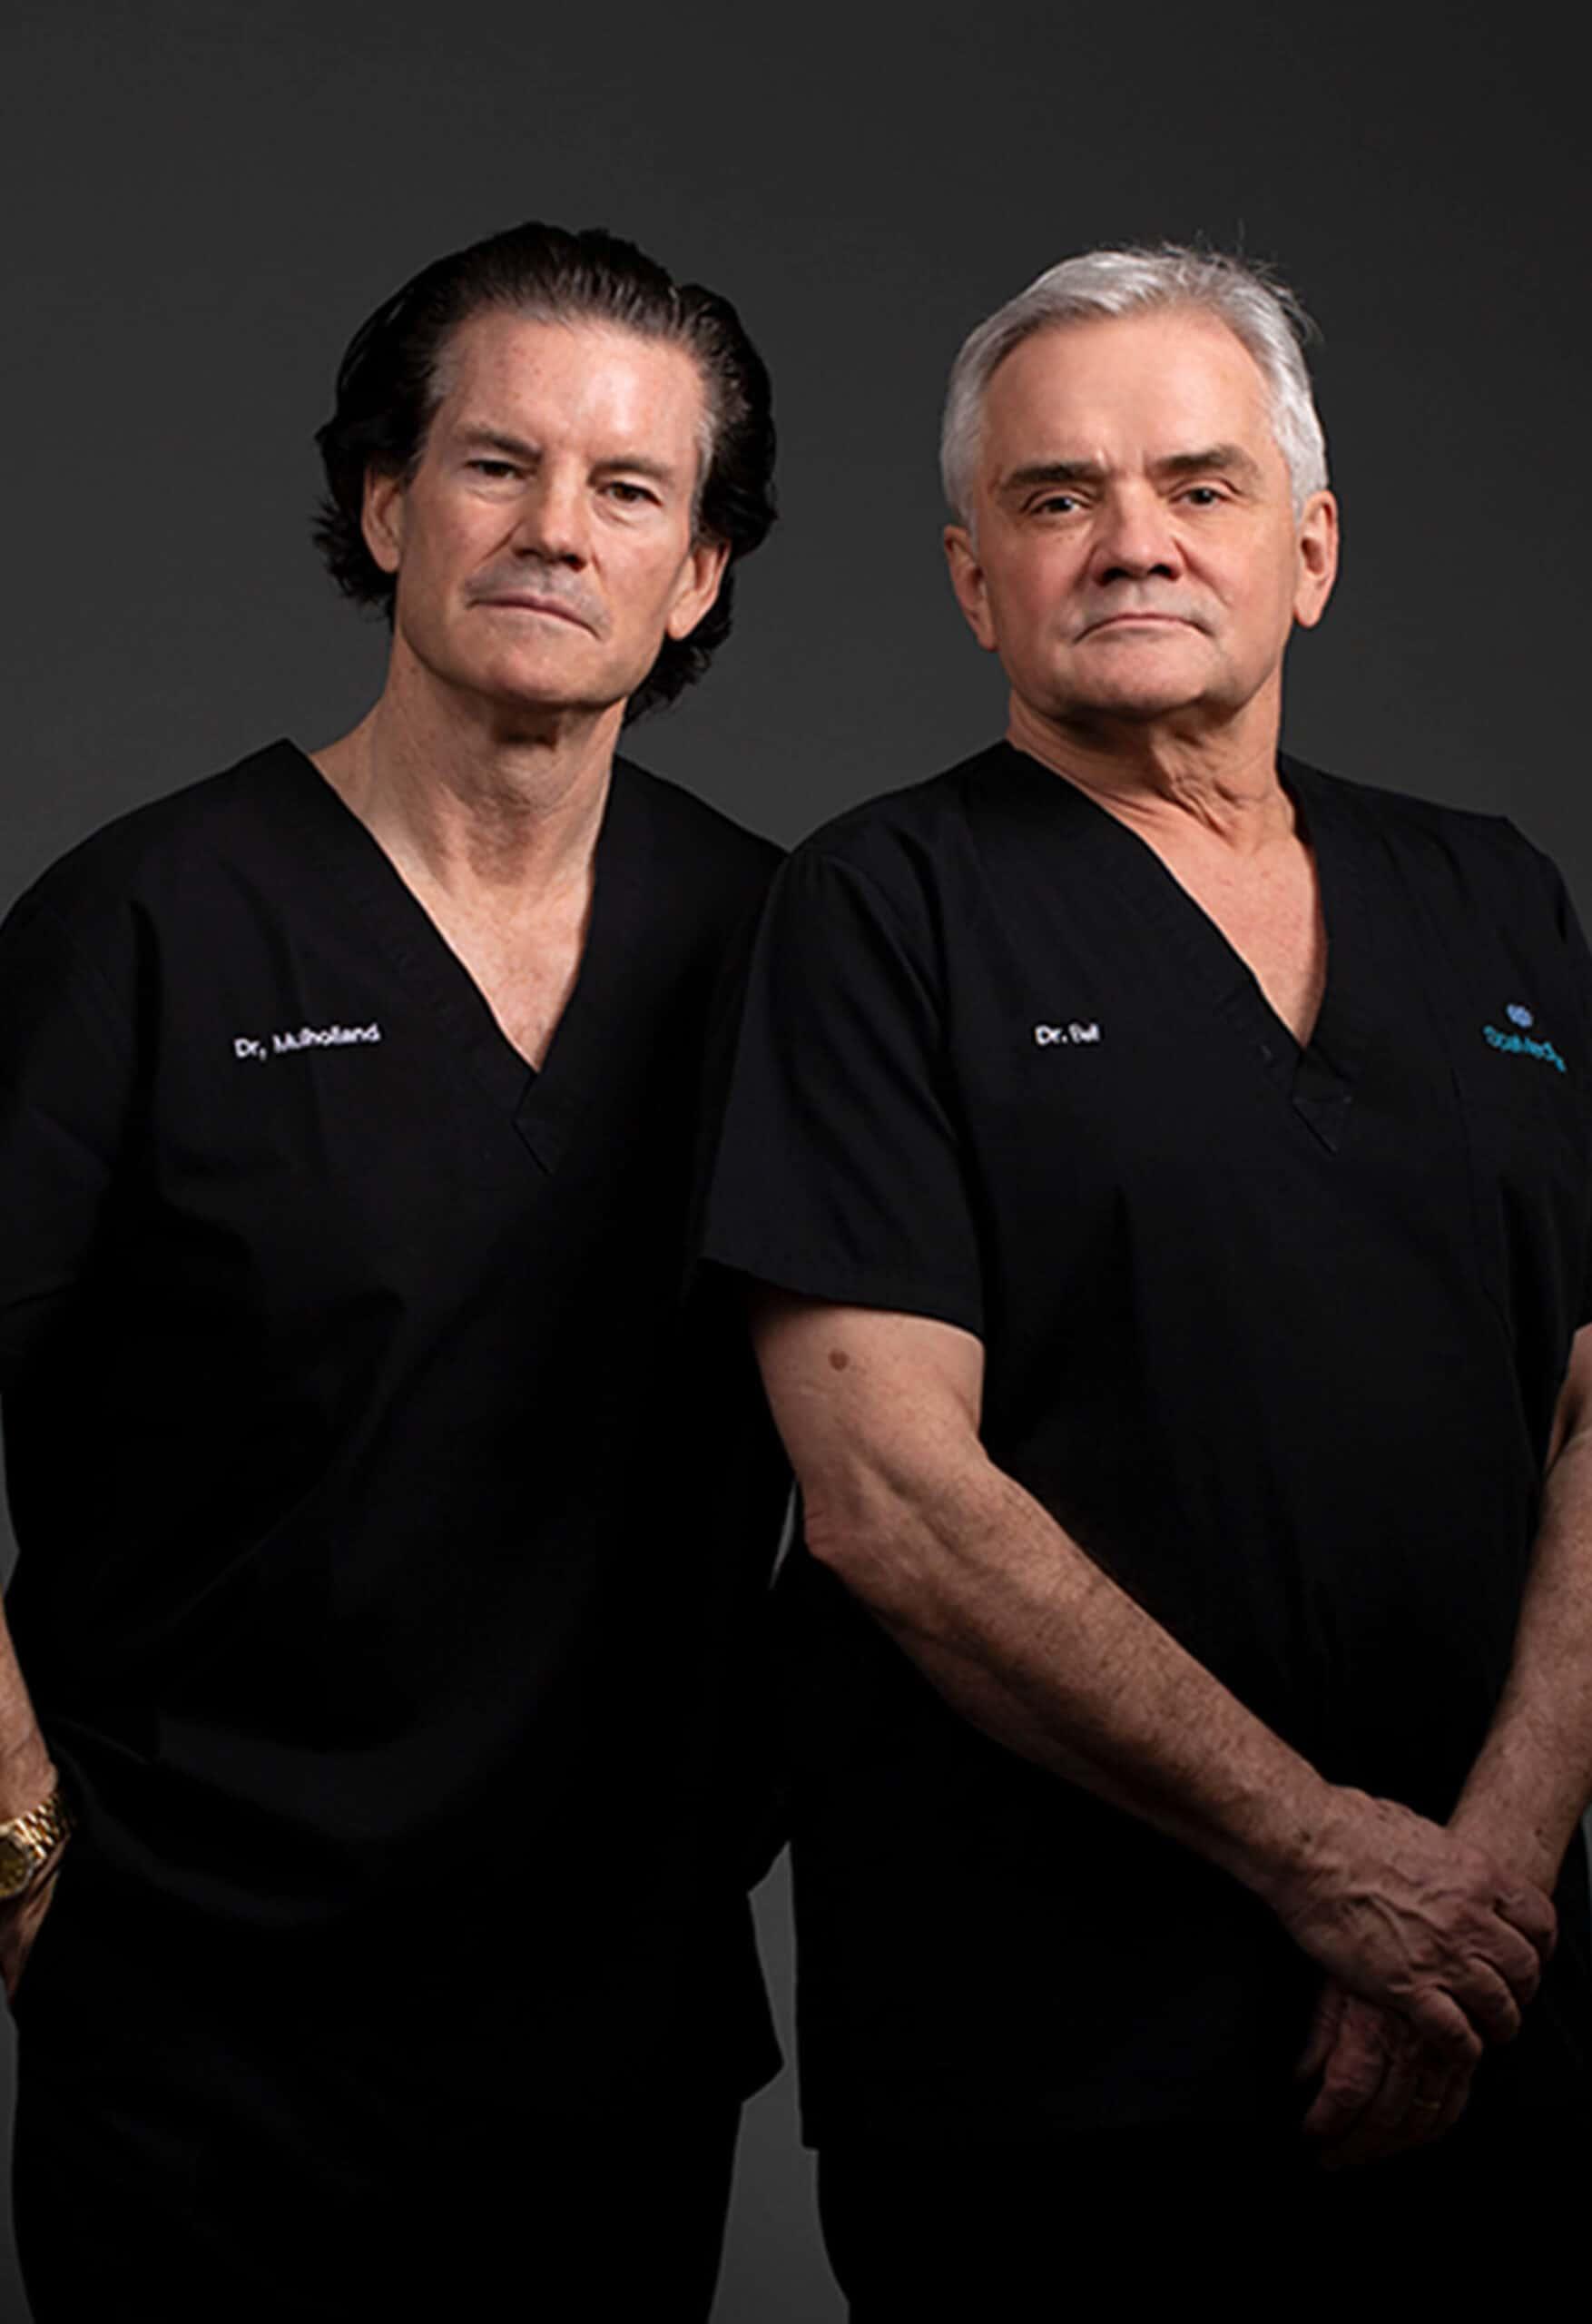 Homepage - Dr. Mulholland & Dr. Bell - Experts Banner - Mobile